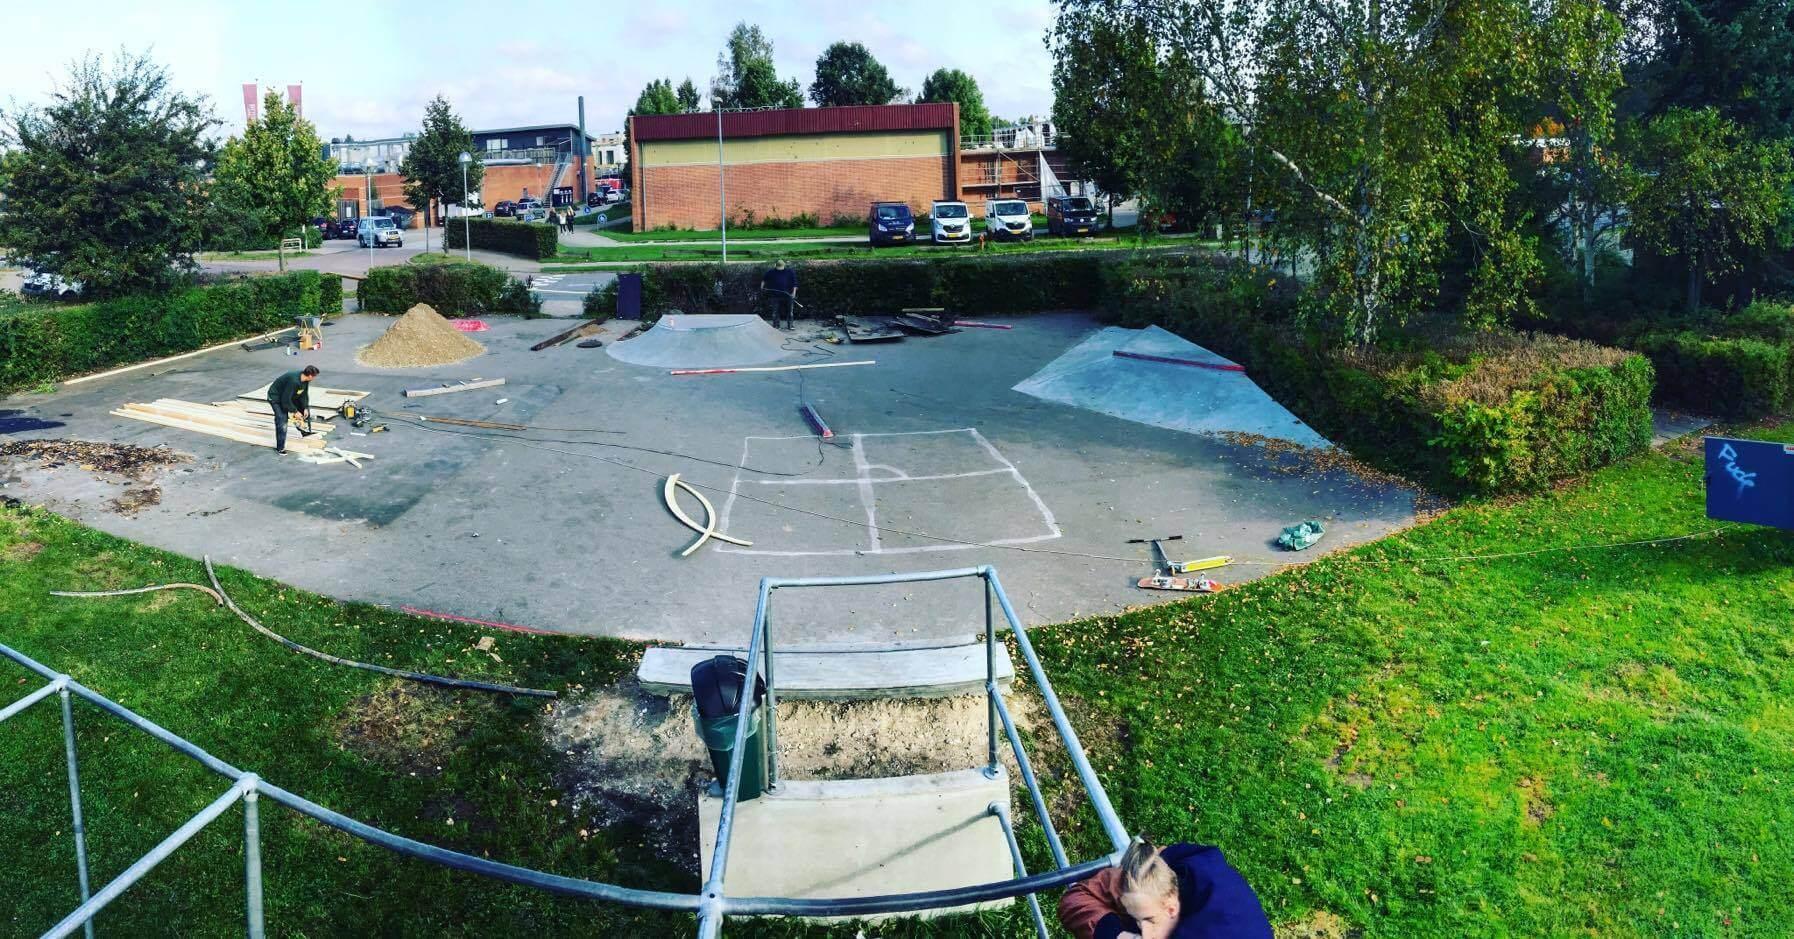 Smorum Skatepark Skatepark I Smorum Skateparks Dk